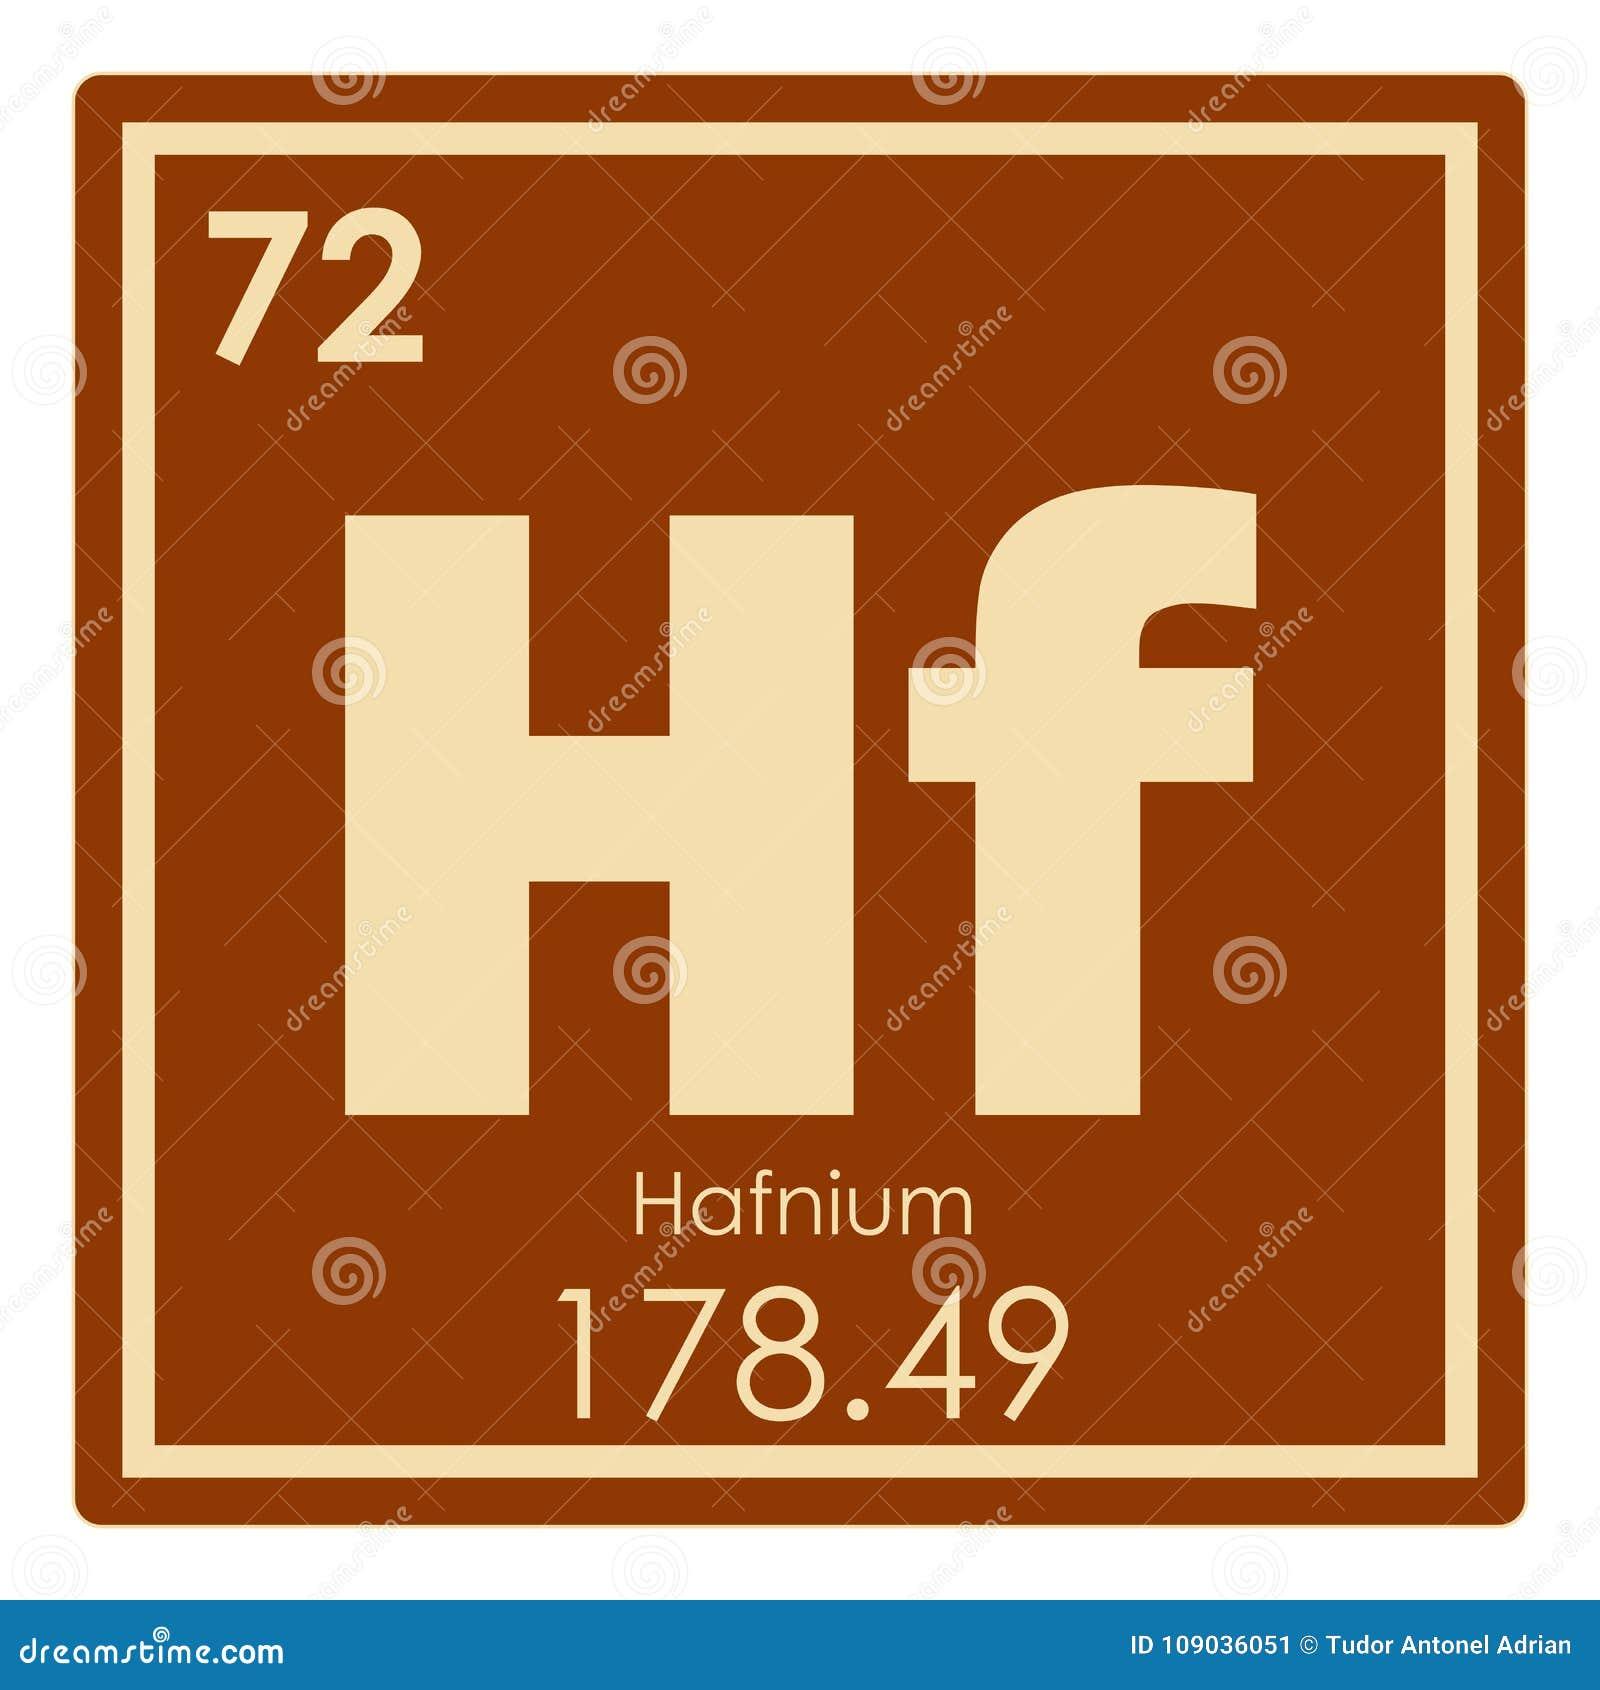 Hafnium chemical element stock illustration illustration of hafnium chemical element urtaz Image collections